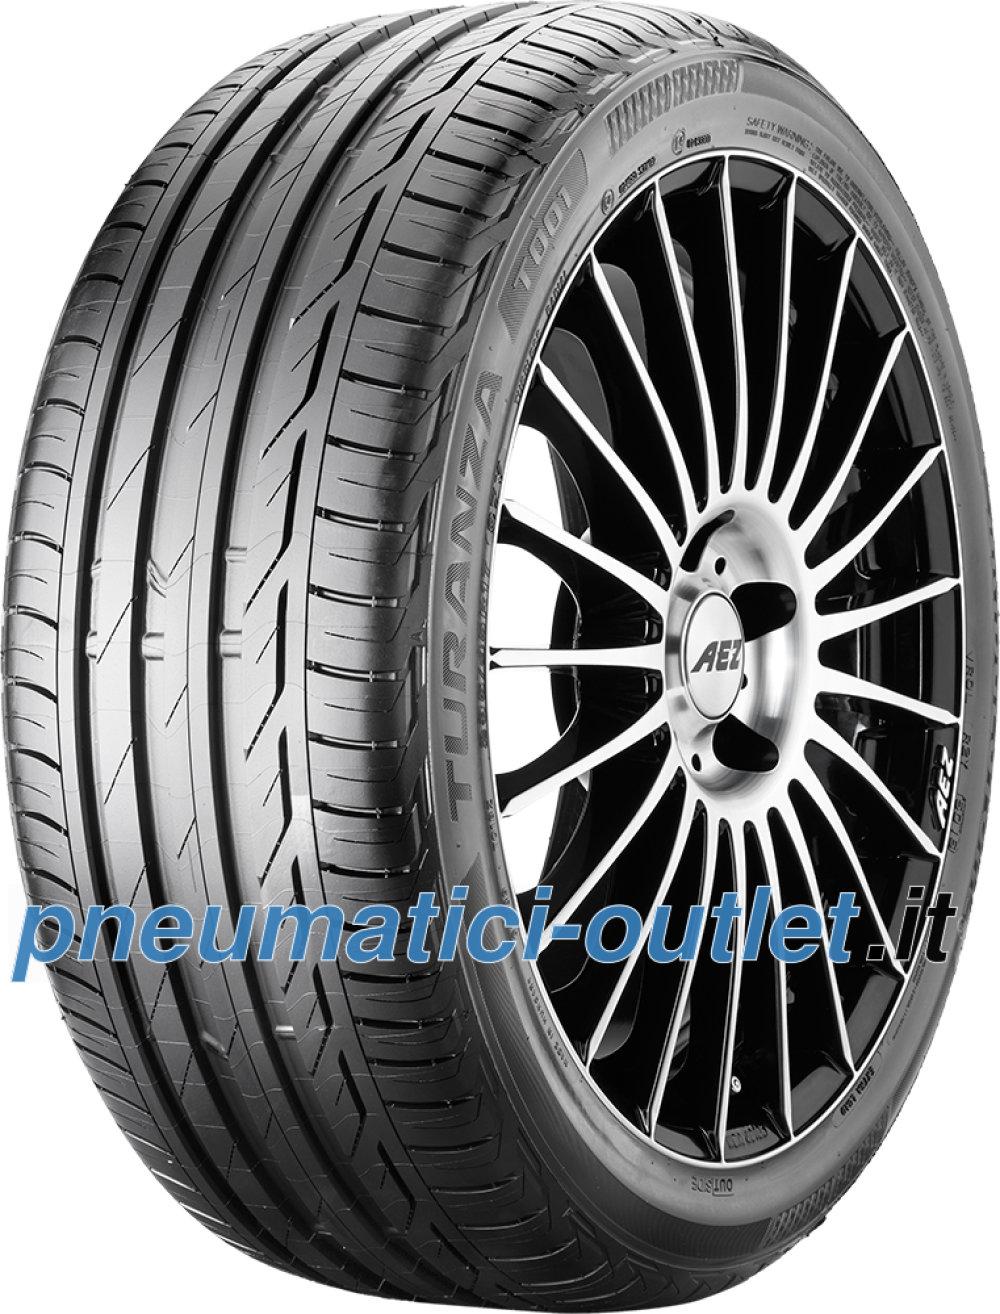 Bridgestone Turanza T001 Evo ( 225/55 R16 95V )